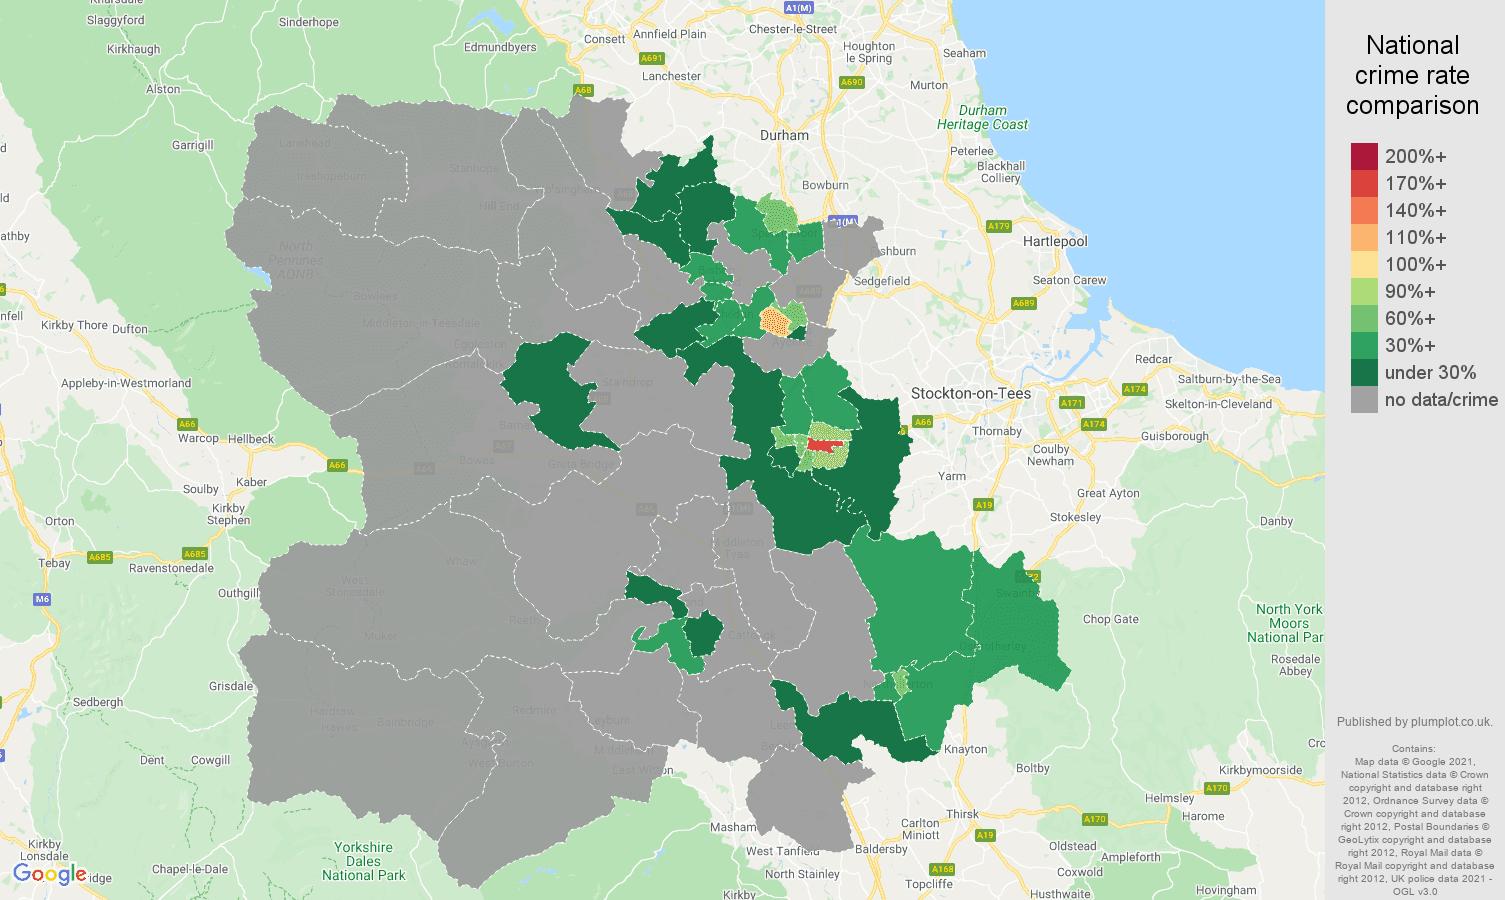 Darlington bicycle theft crime rate comparison map